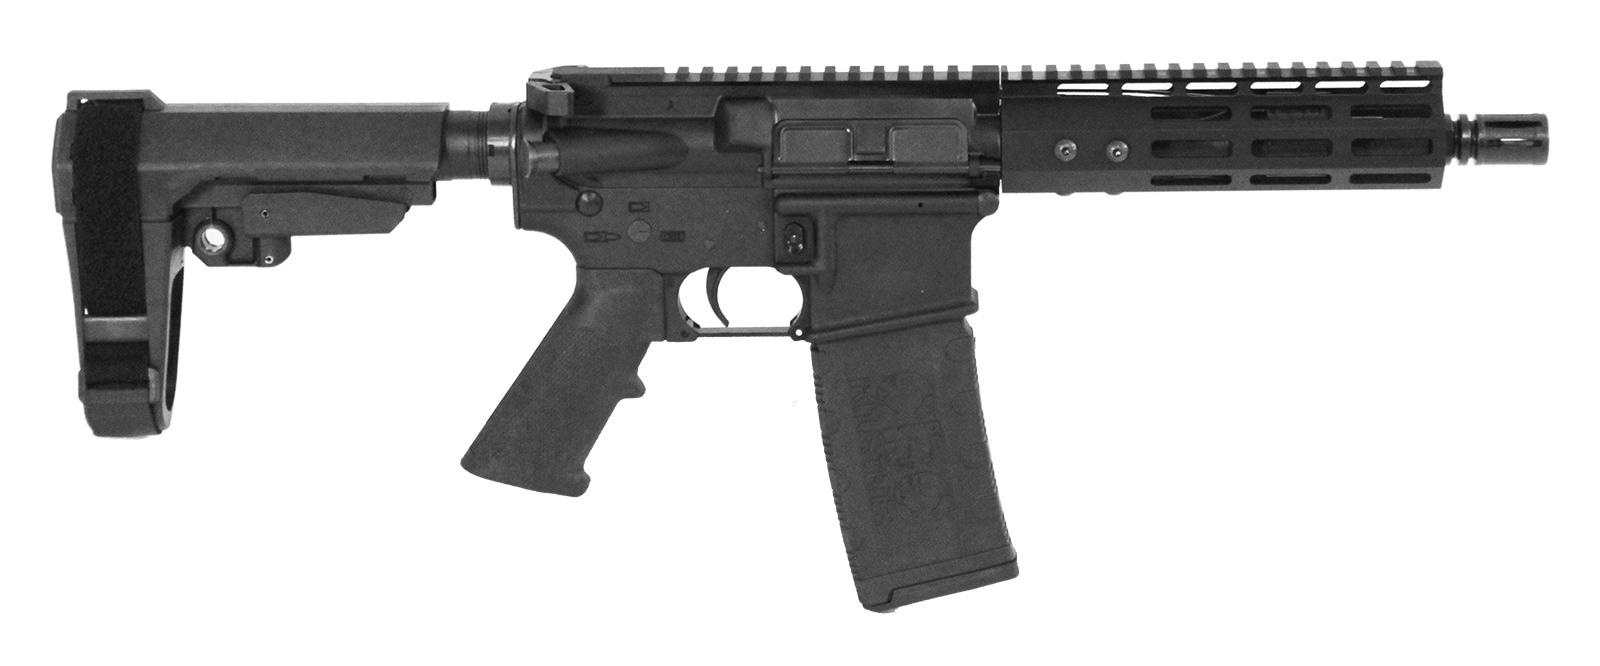 ar15-complete-rifle-7-5-inch-300-aac-18-m-lok-rail-200716